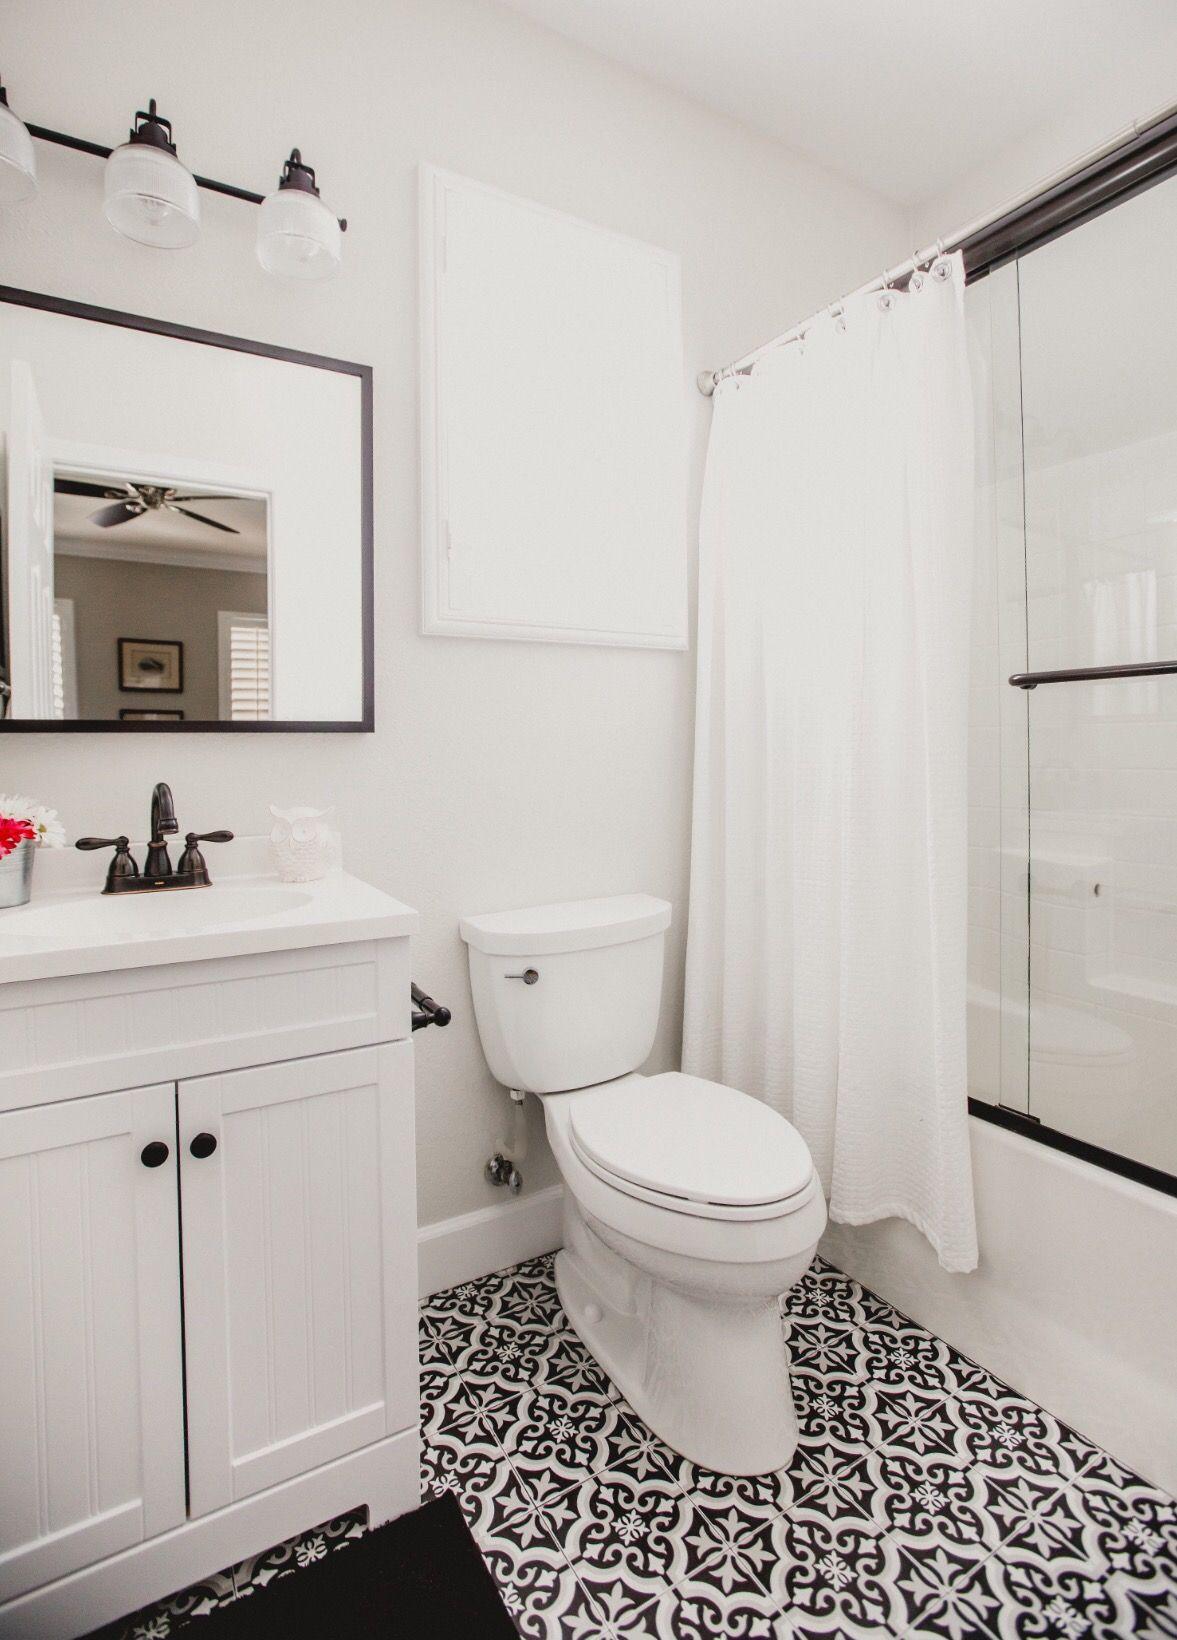 Bathroom Black And White Bathroom Classic Bathroom Merola Tile Lowes Vanity Bathroom Design Black Bathroom Bathrooms Remodel Bathroom Design Small